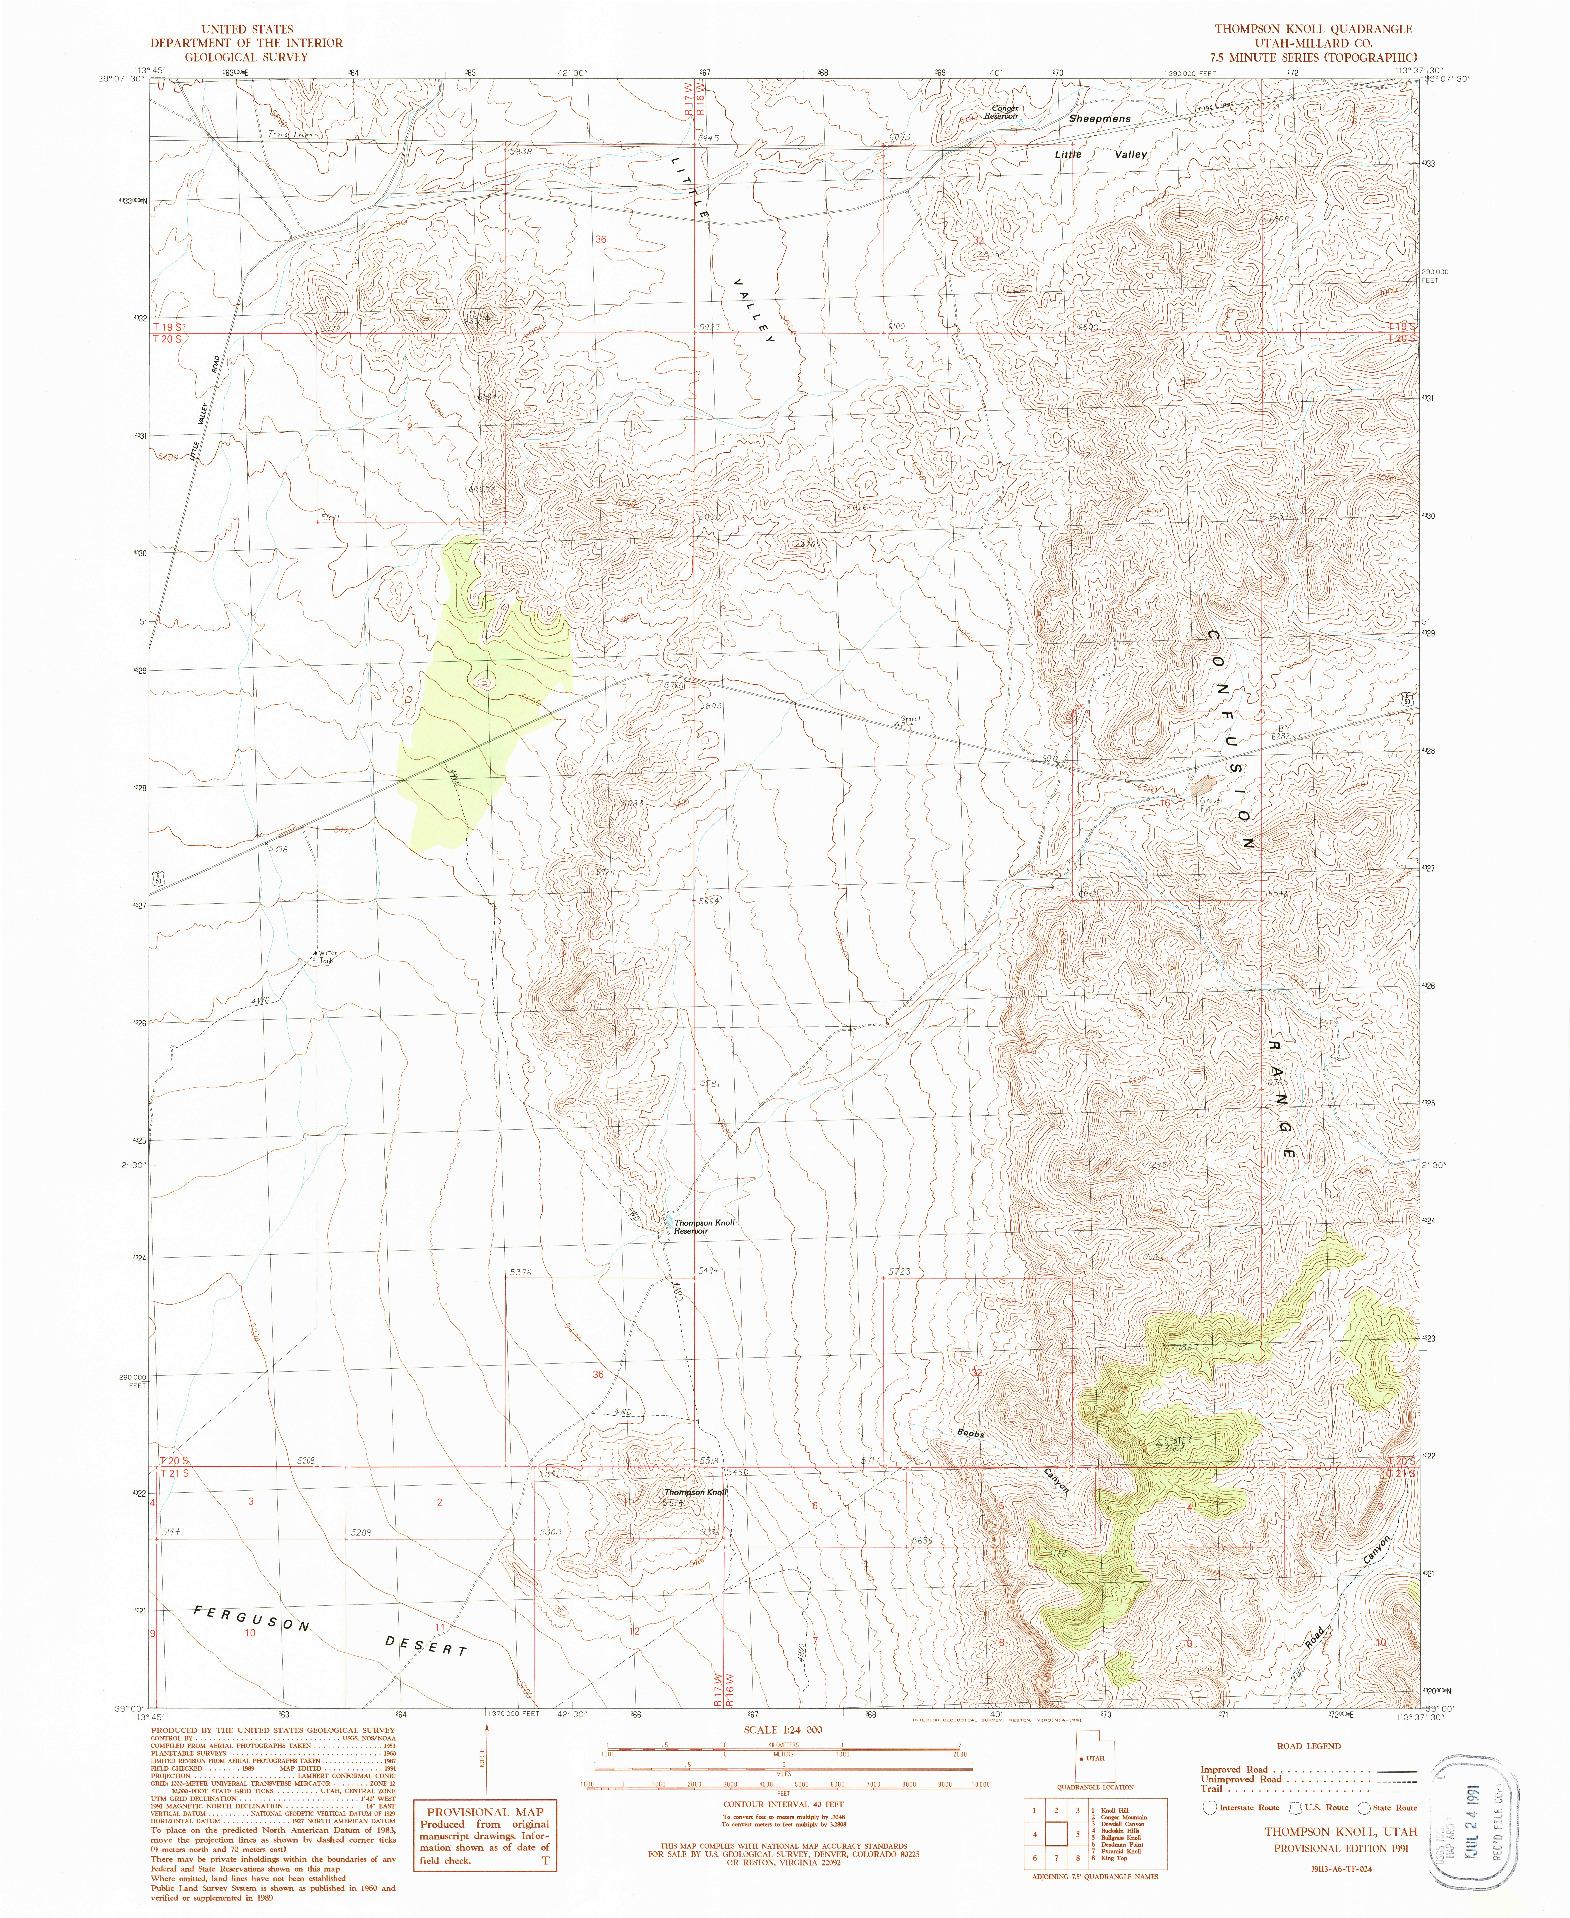 USGS 1:24000-SCALE QUADRANGLE FOR THOMPSON KNOLL, UT 1991